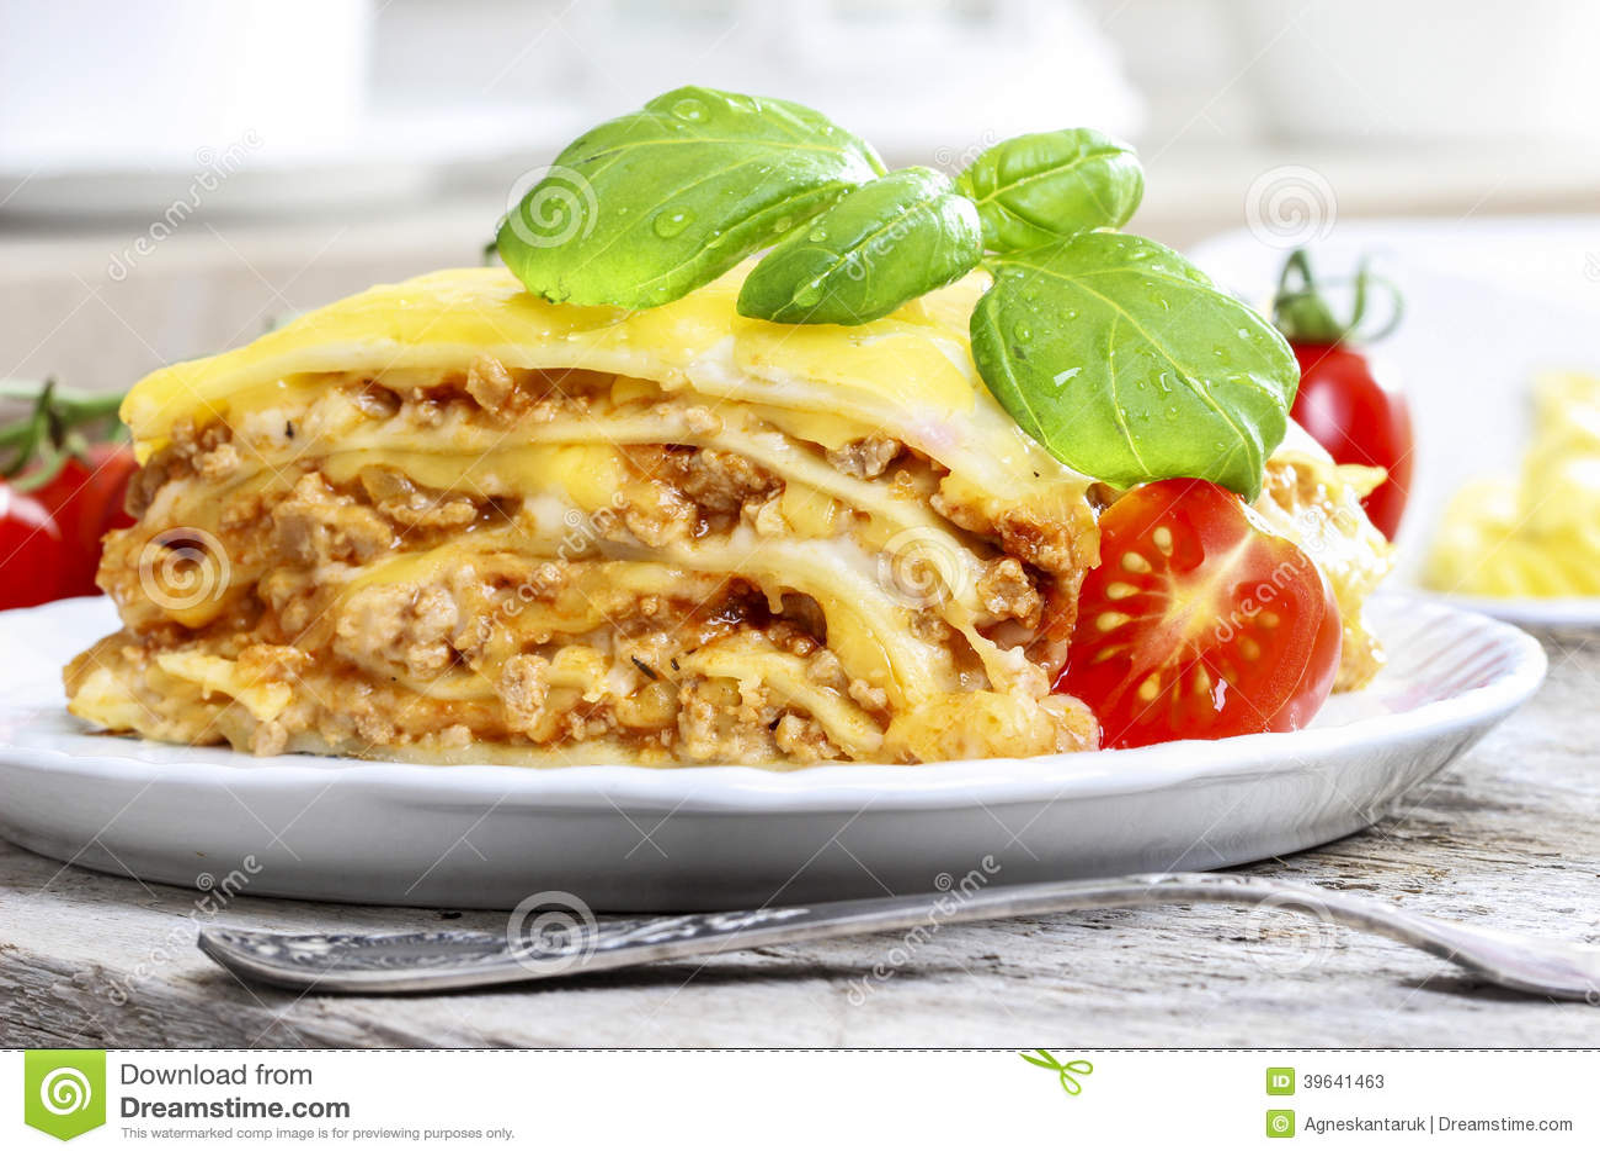 lasagne plat italien traditionnel photo stock image 39641463. Black Bedroom Furniture Sets. Home Design Ideas